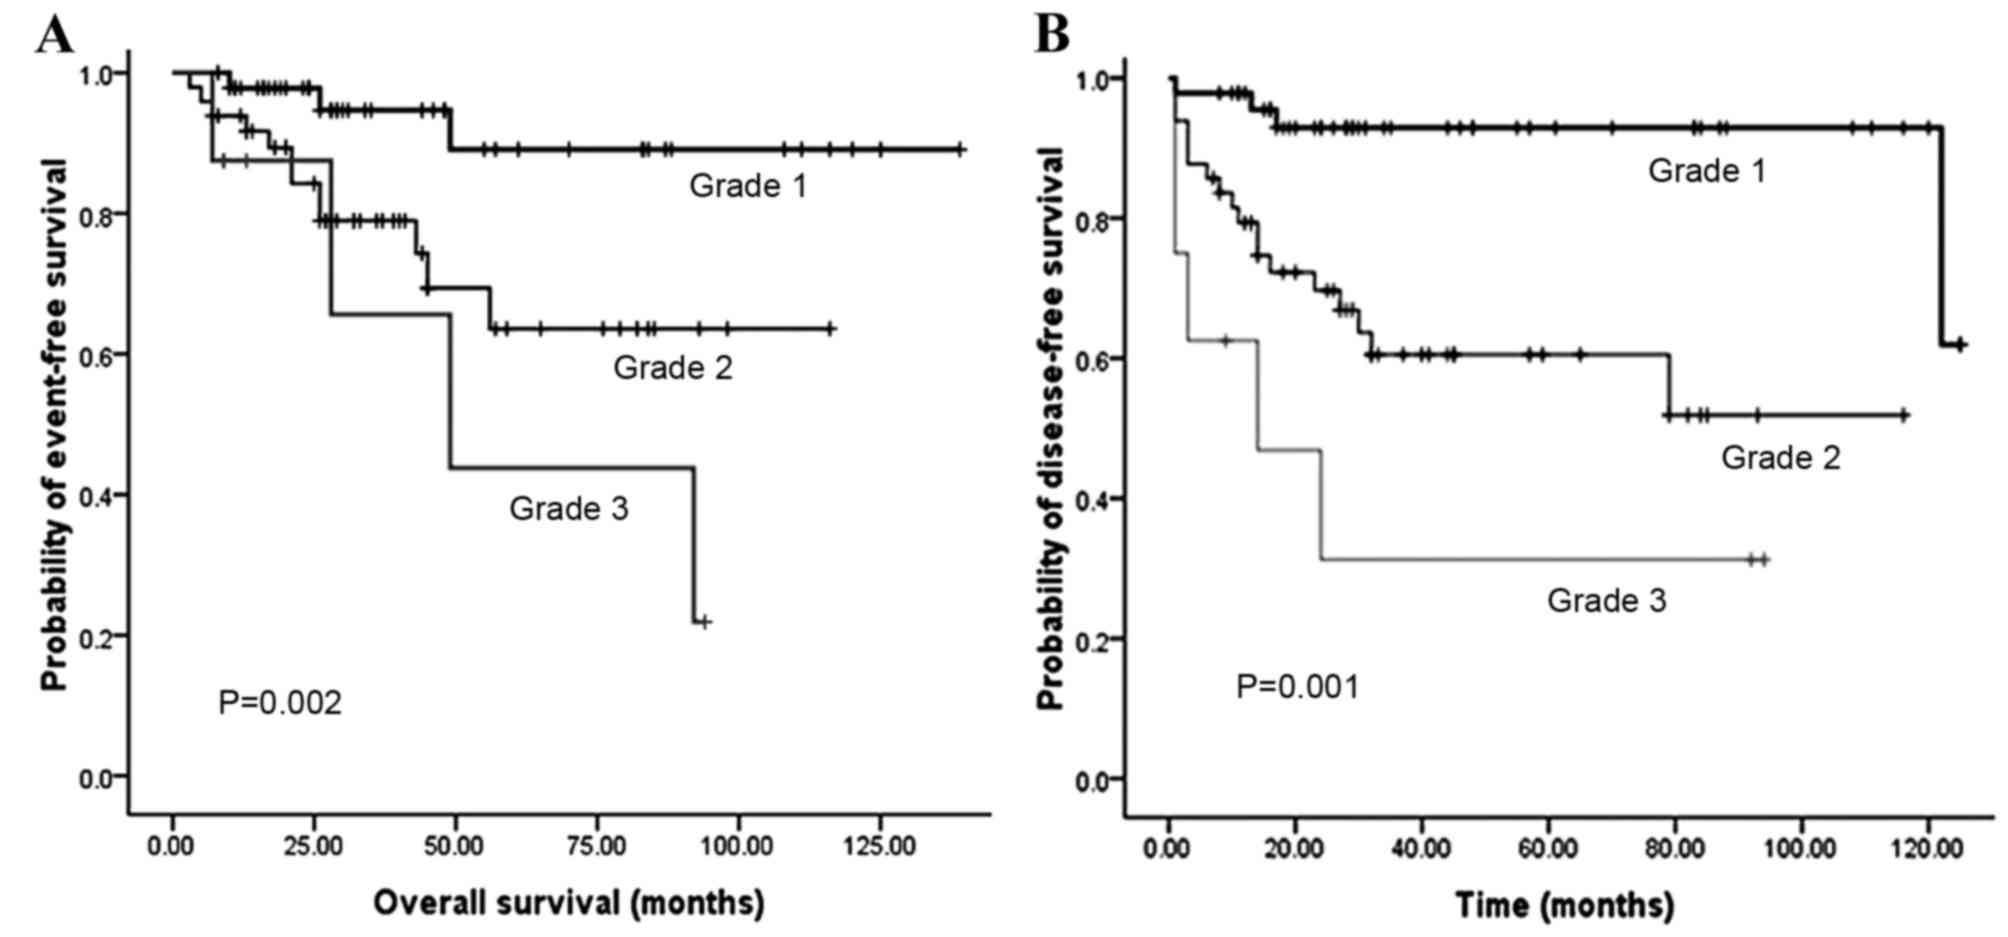 neuroendocrine cancer stage 3 survival rate human papillomavirus vaccine brands